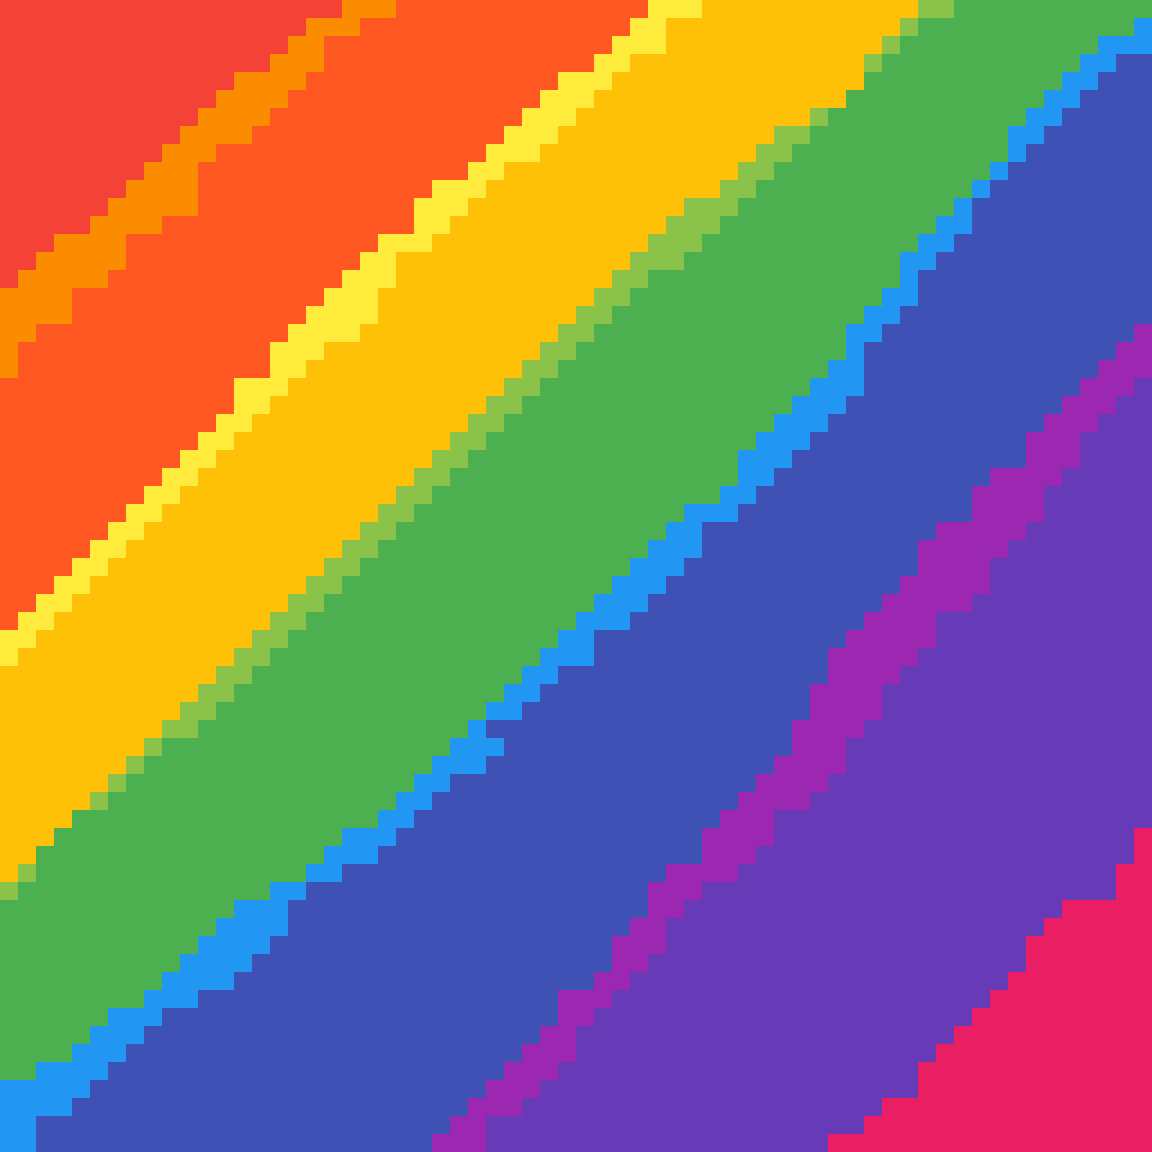 Rainbow blast by Bongo